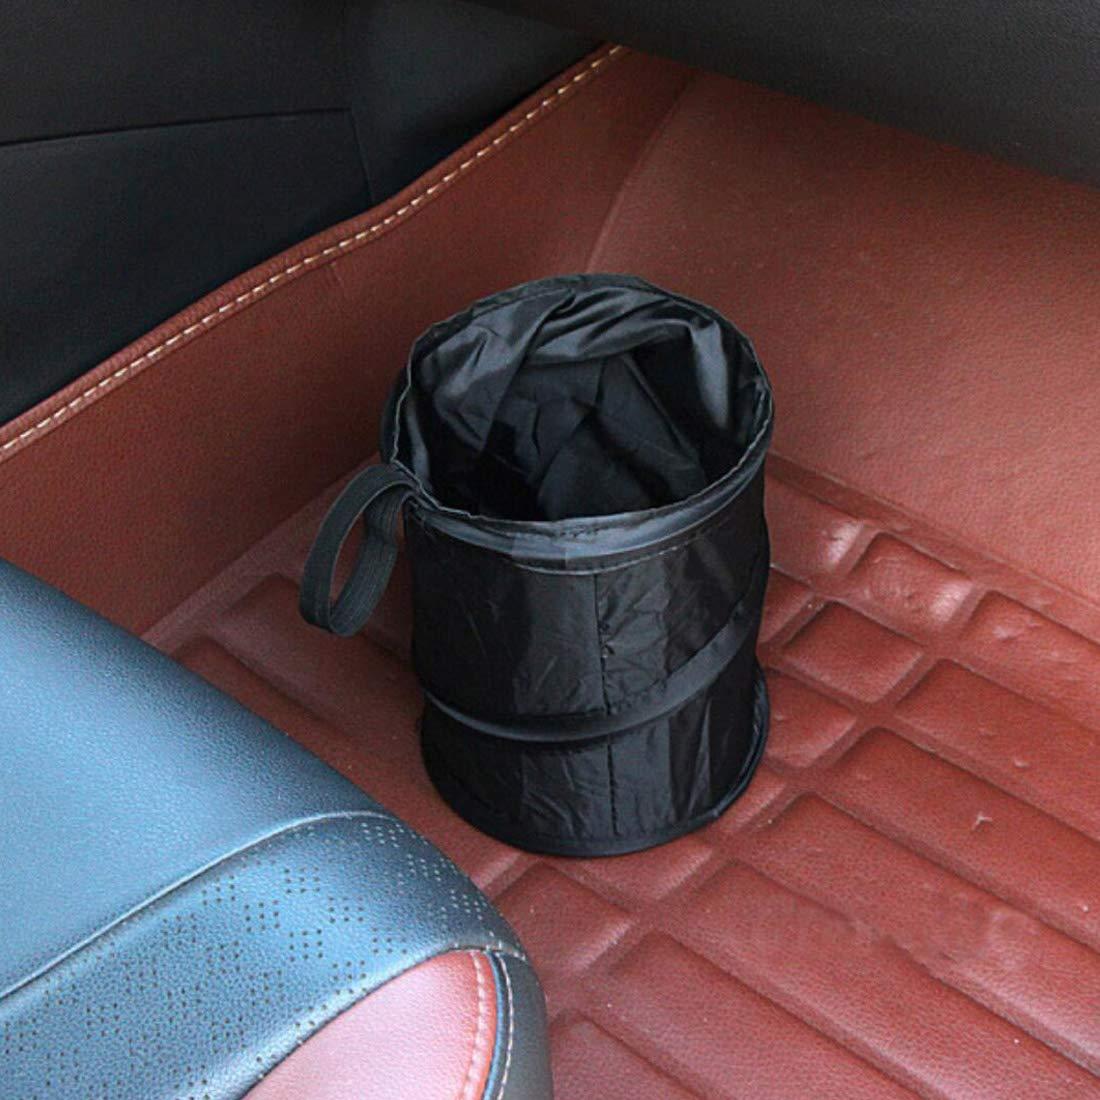 UTSAUTO Car Trash Can Portable Garbage Bin Collapsible Pop-up Leak Proof Trash Can Bag Waste Basket Bin Rubbish Bin 2Pcs